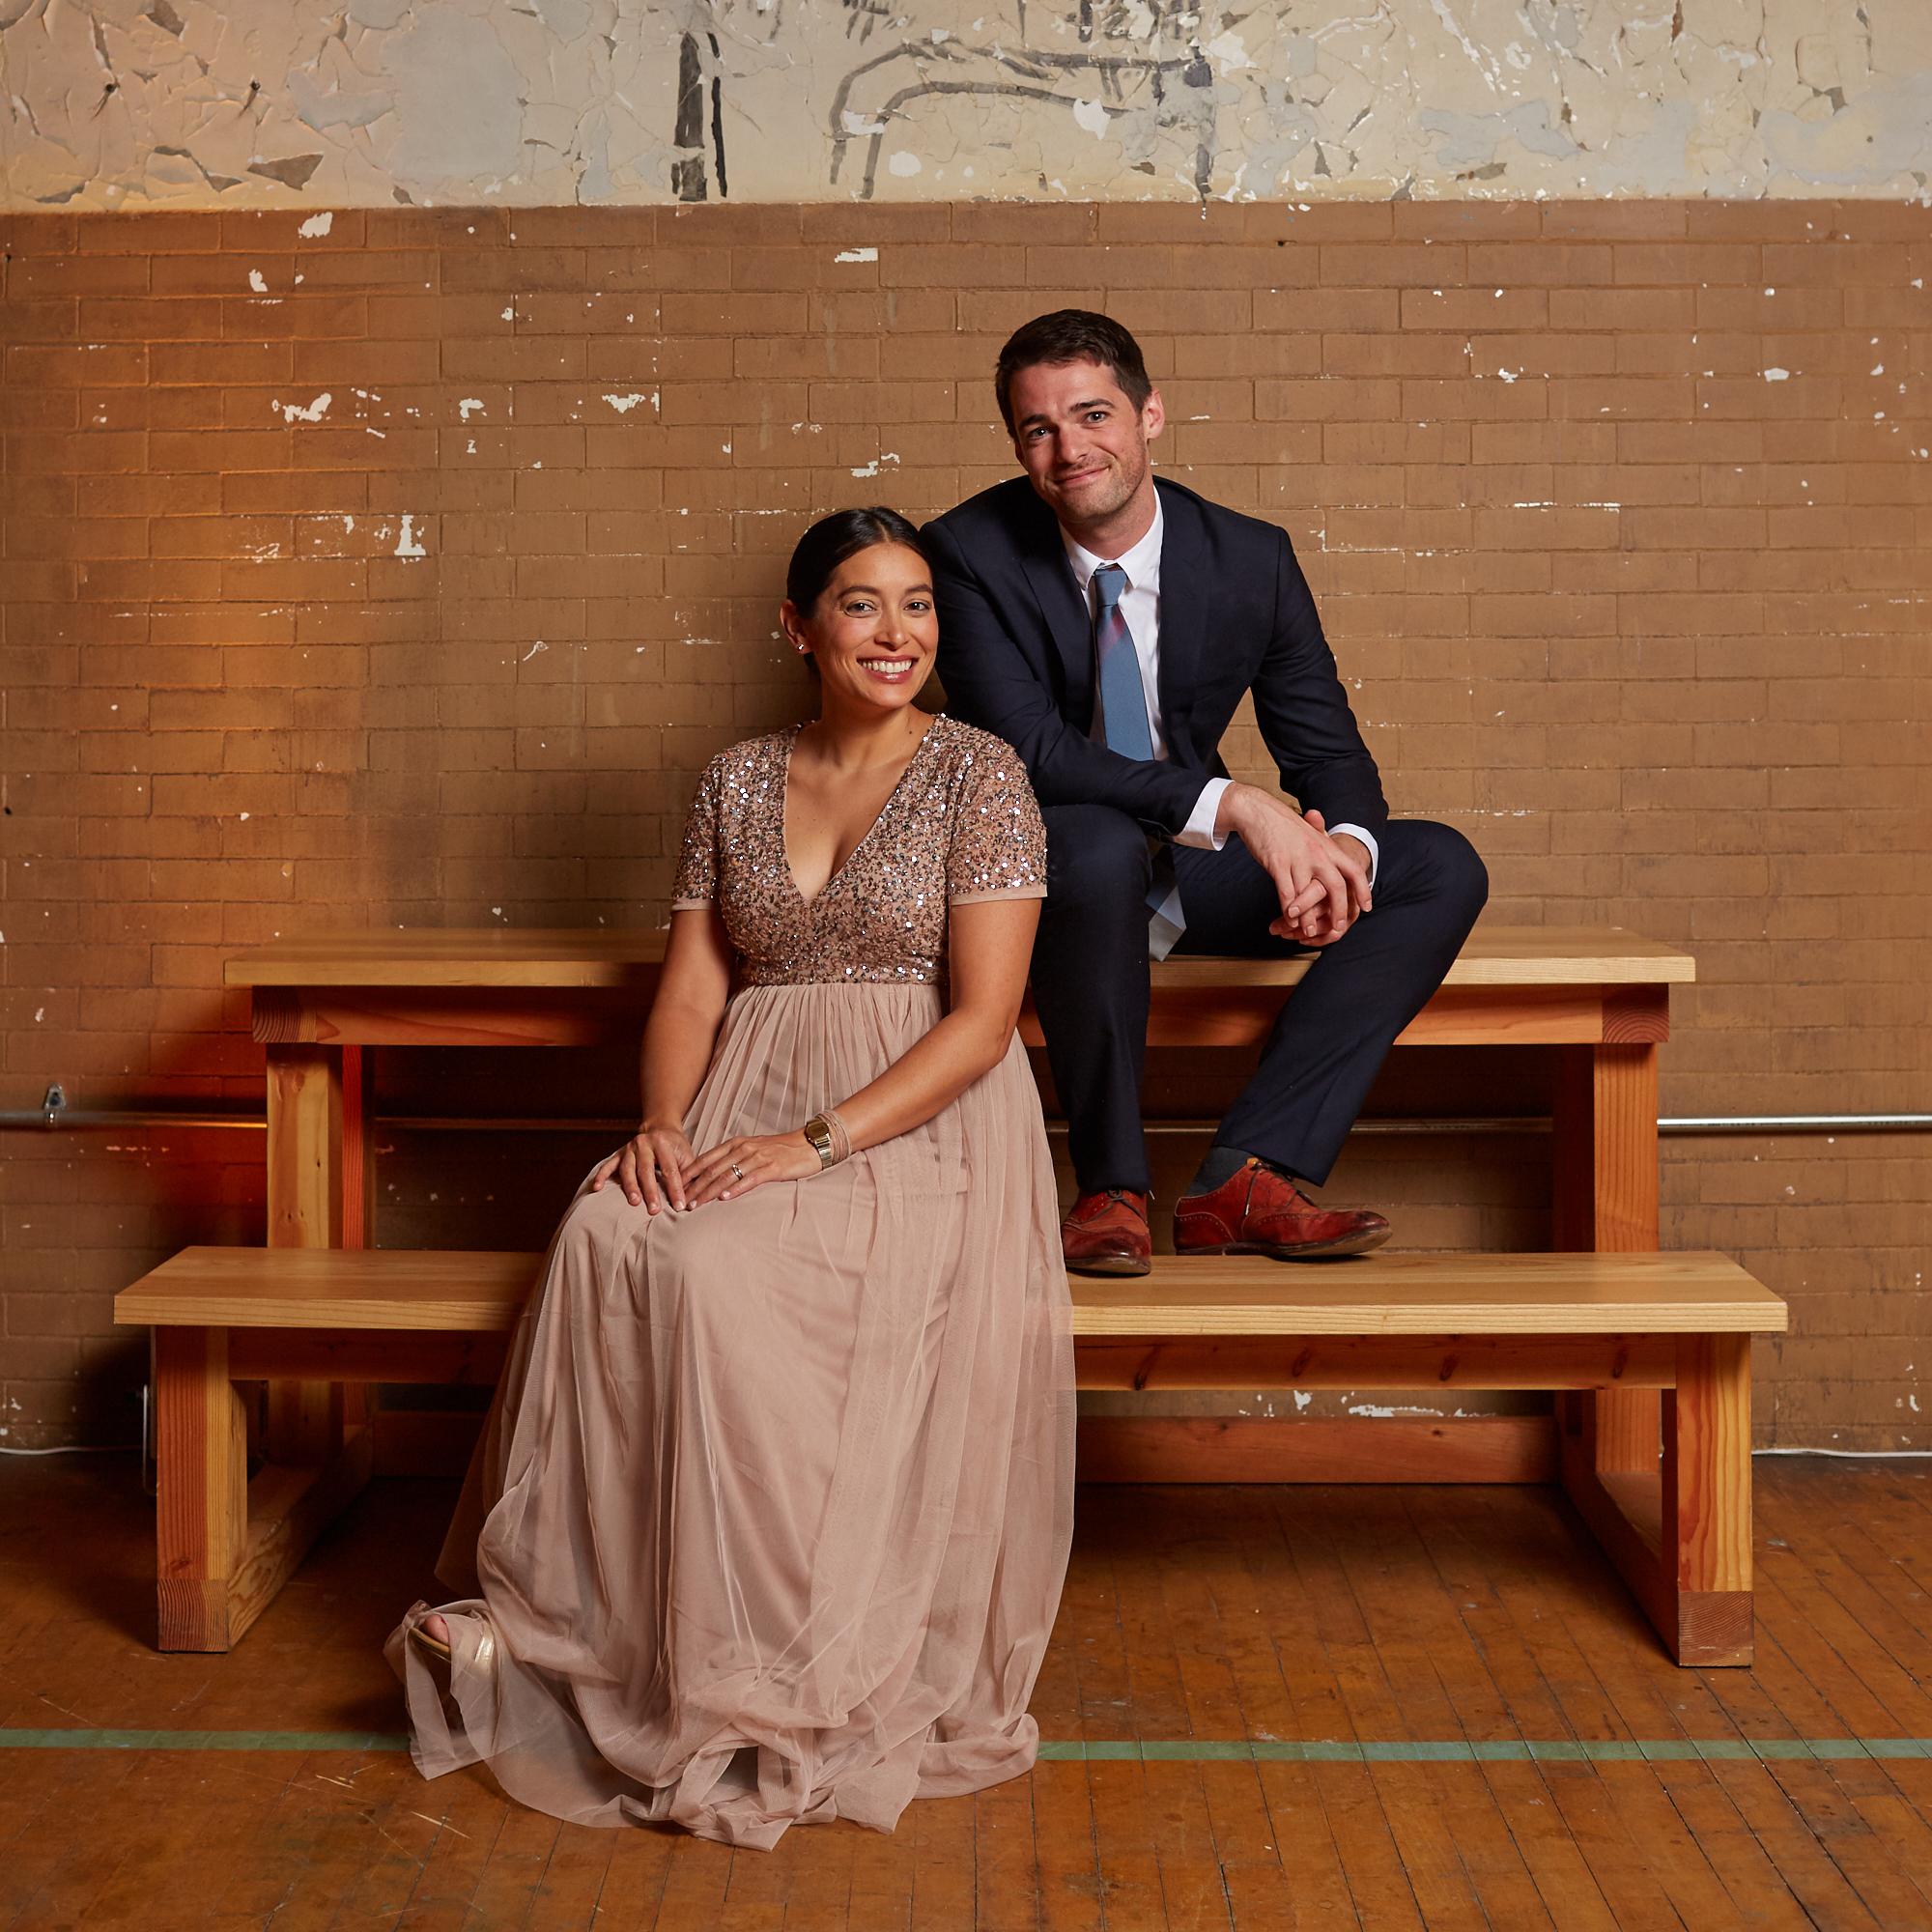 Ryan Hannah Sims - 2017.09 - Wedding Photos - 913.jpg